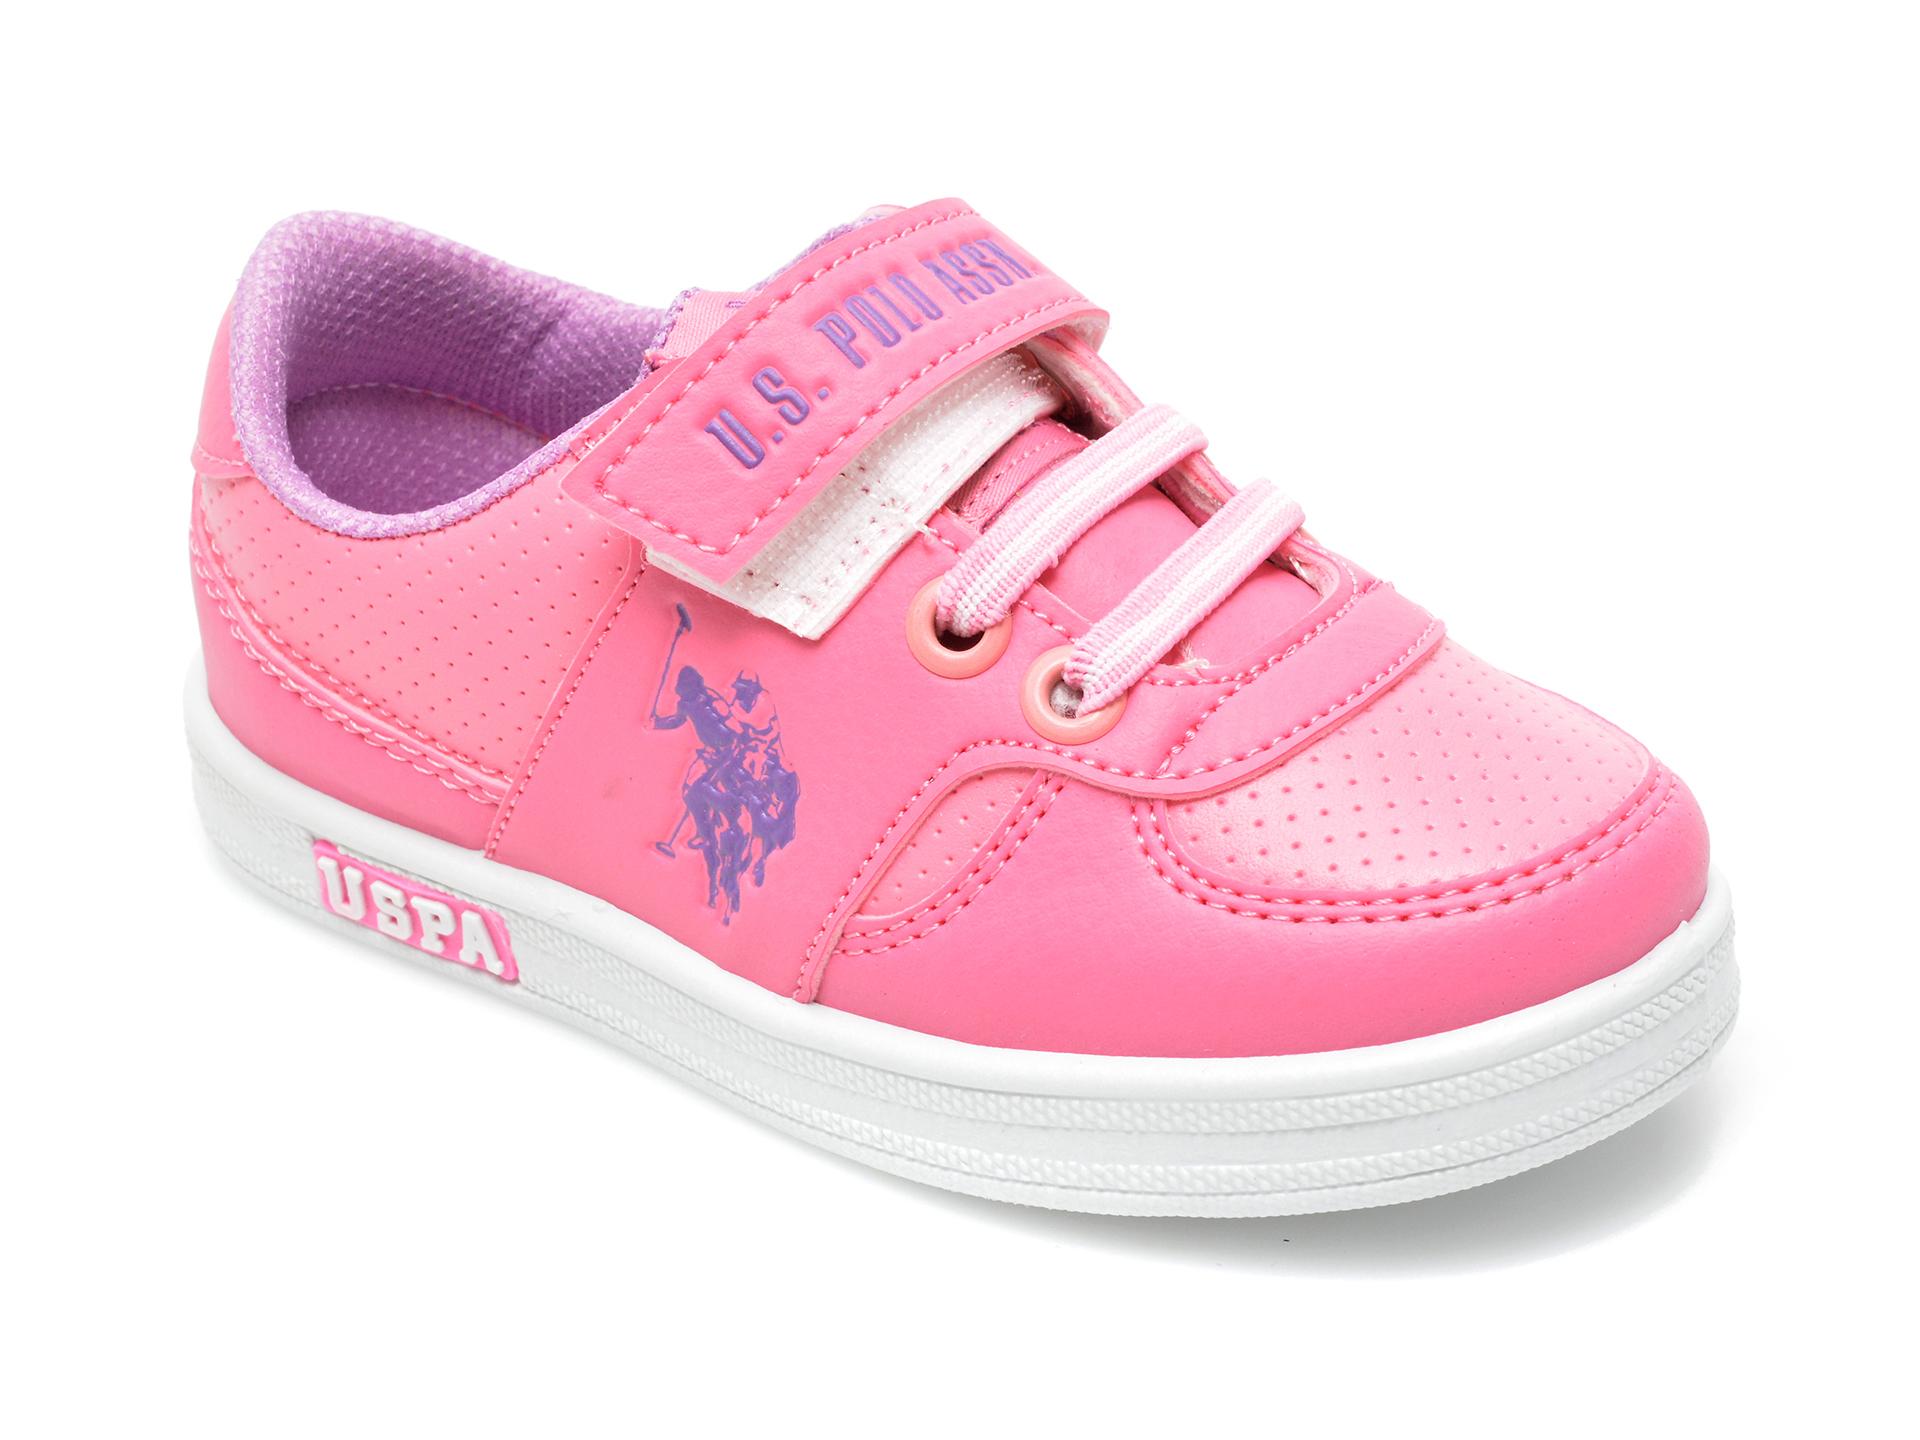 Pantofi sport US POLO ASSN roz, CAME1FX, din piele ecologica